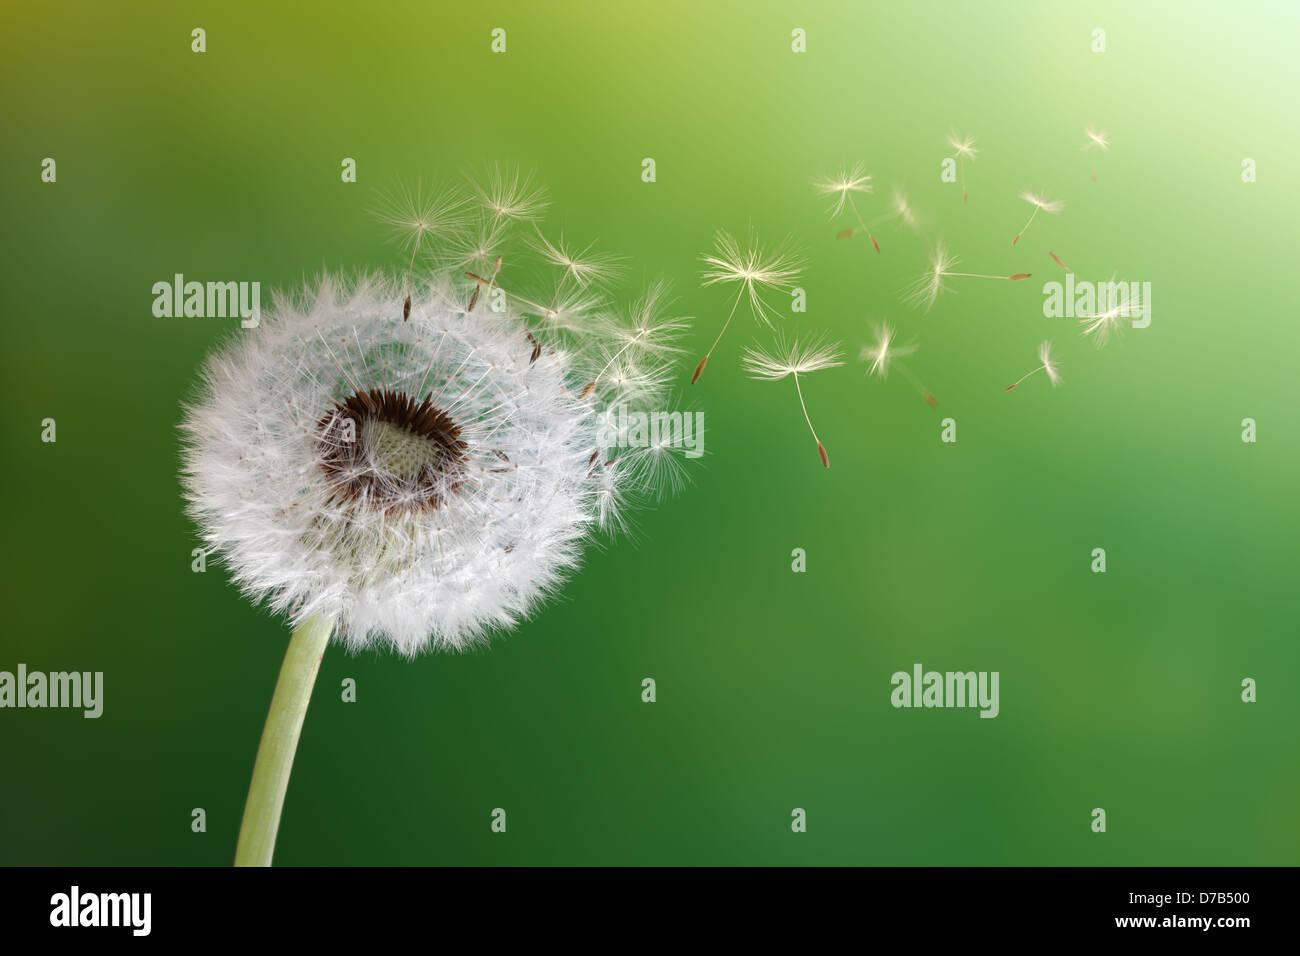 Jaramago reloj en sol de mañana Imagen De Stock